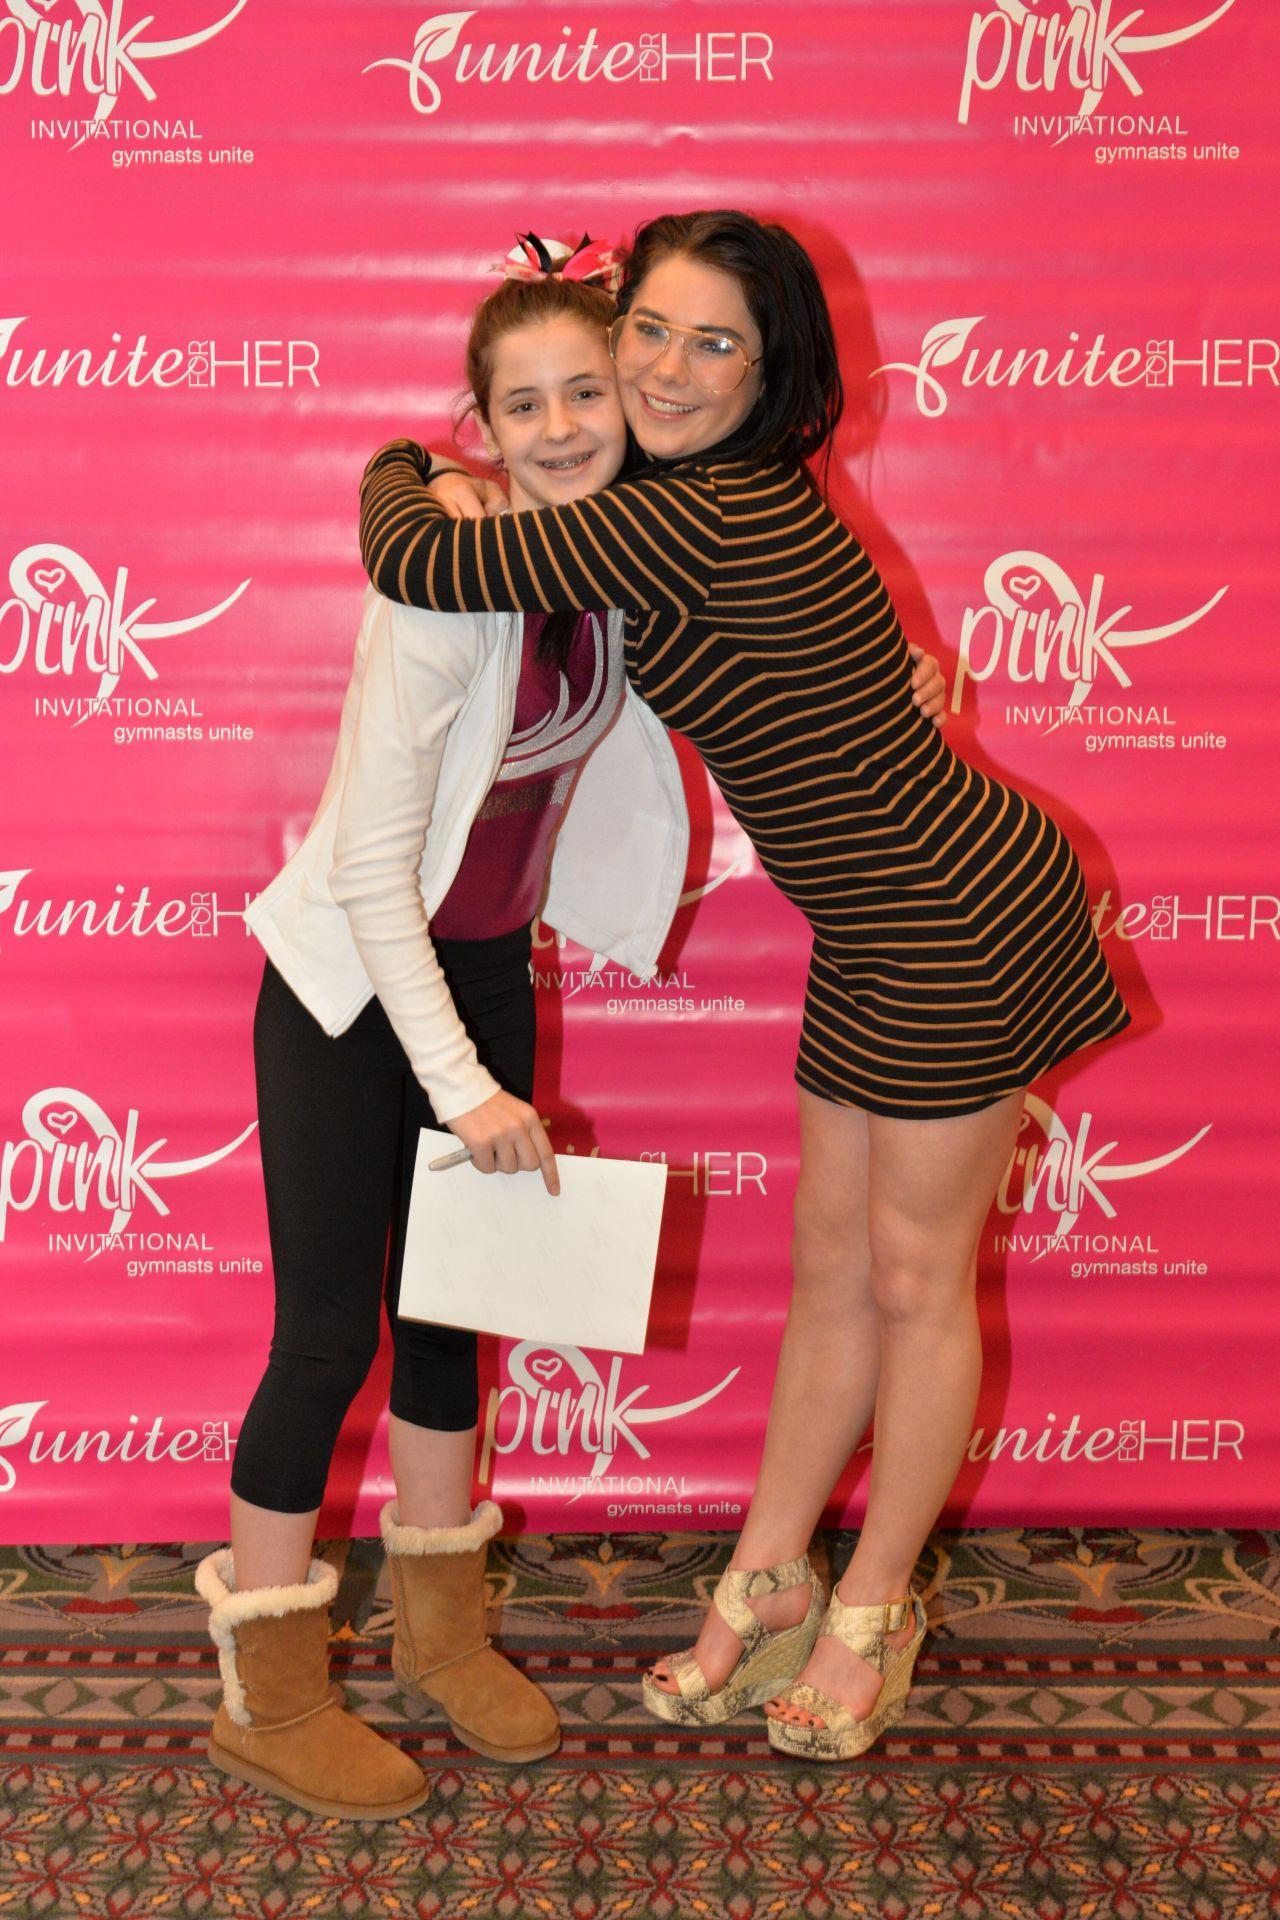 mckayla maroney pink invitational gymnastics in